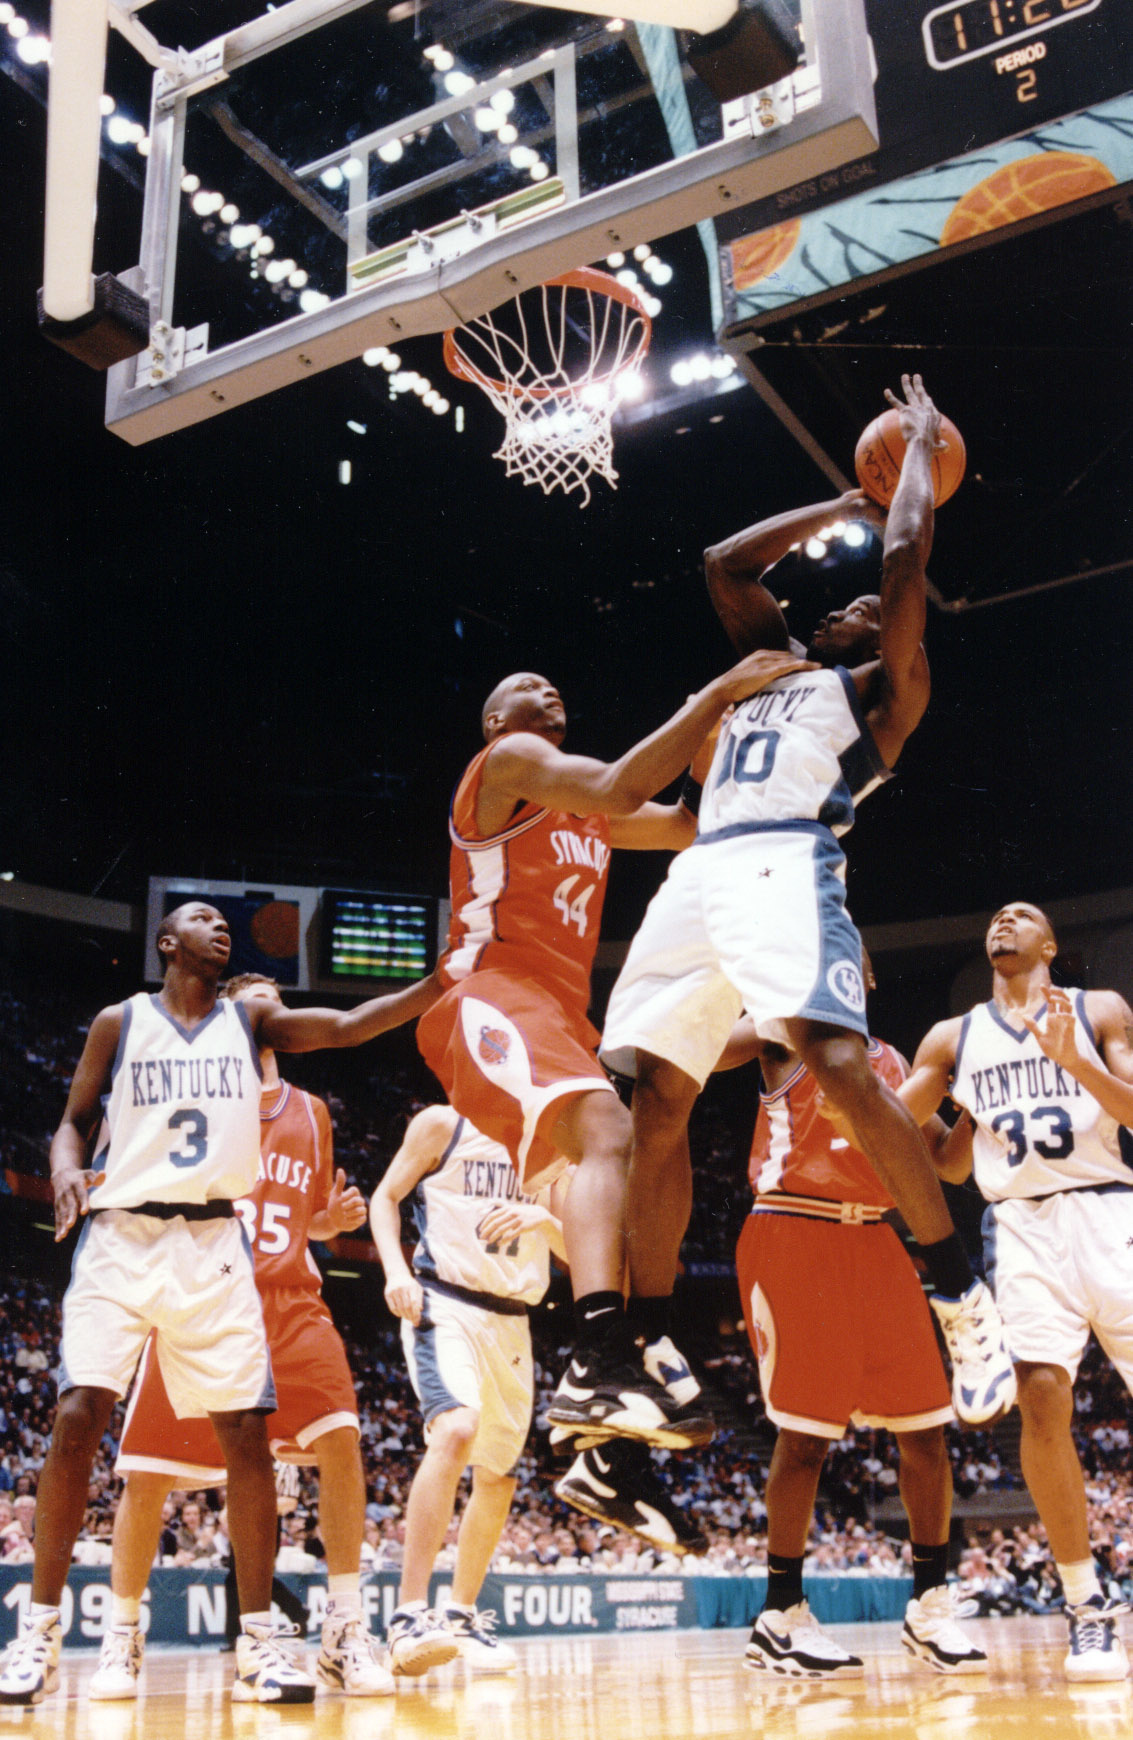 1996 NCAA Champion Tony Delk | Basketball Video Analysis